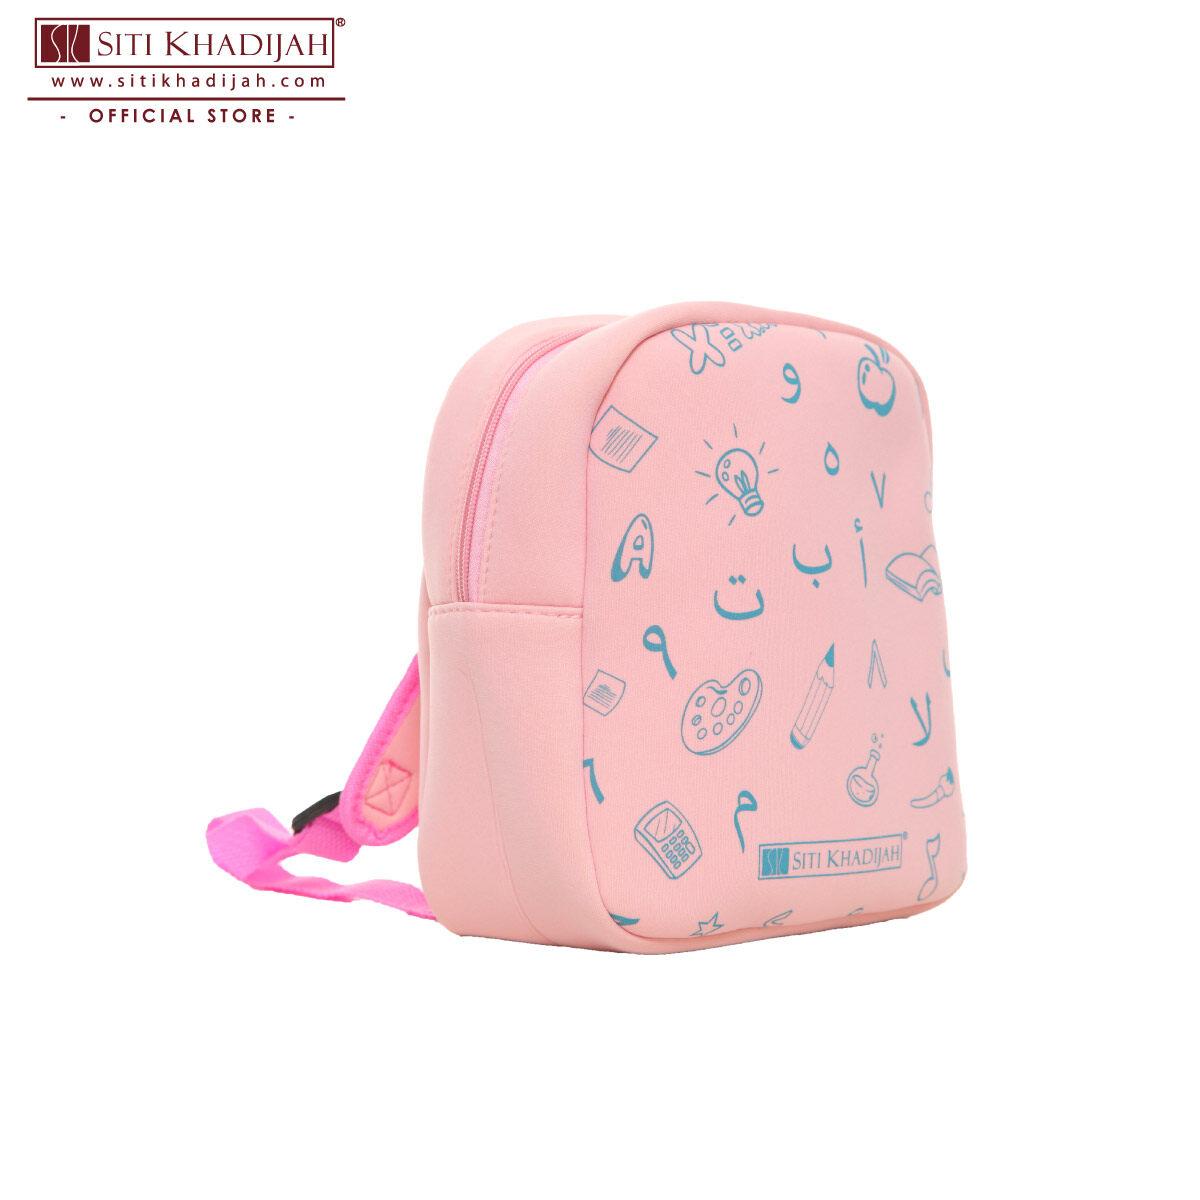 Siti Khadijah Kids Bag